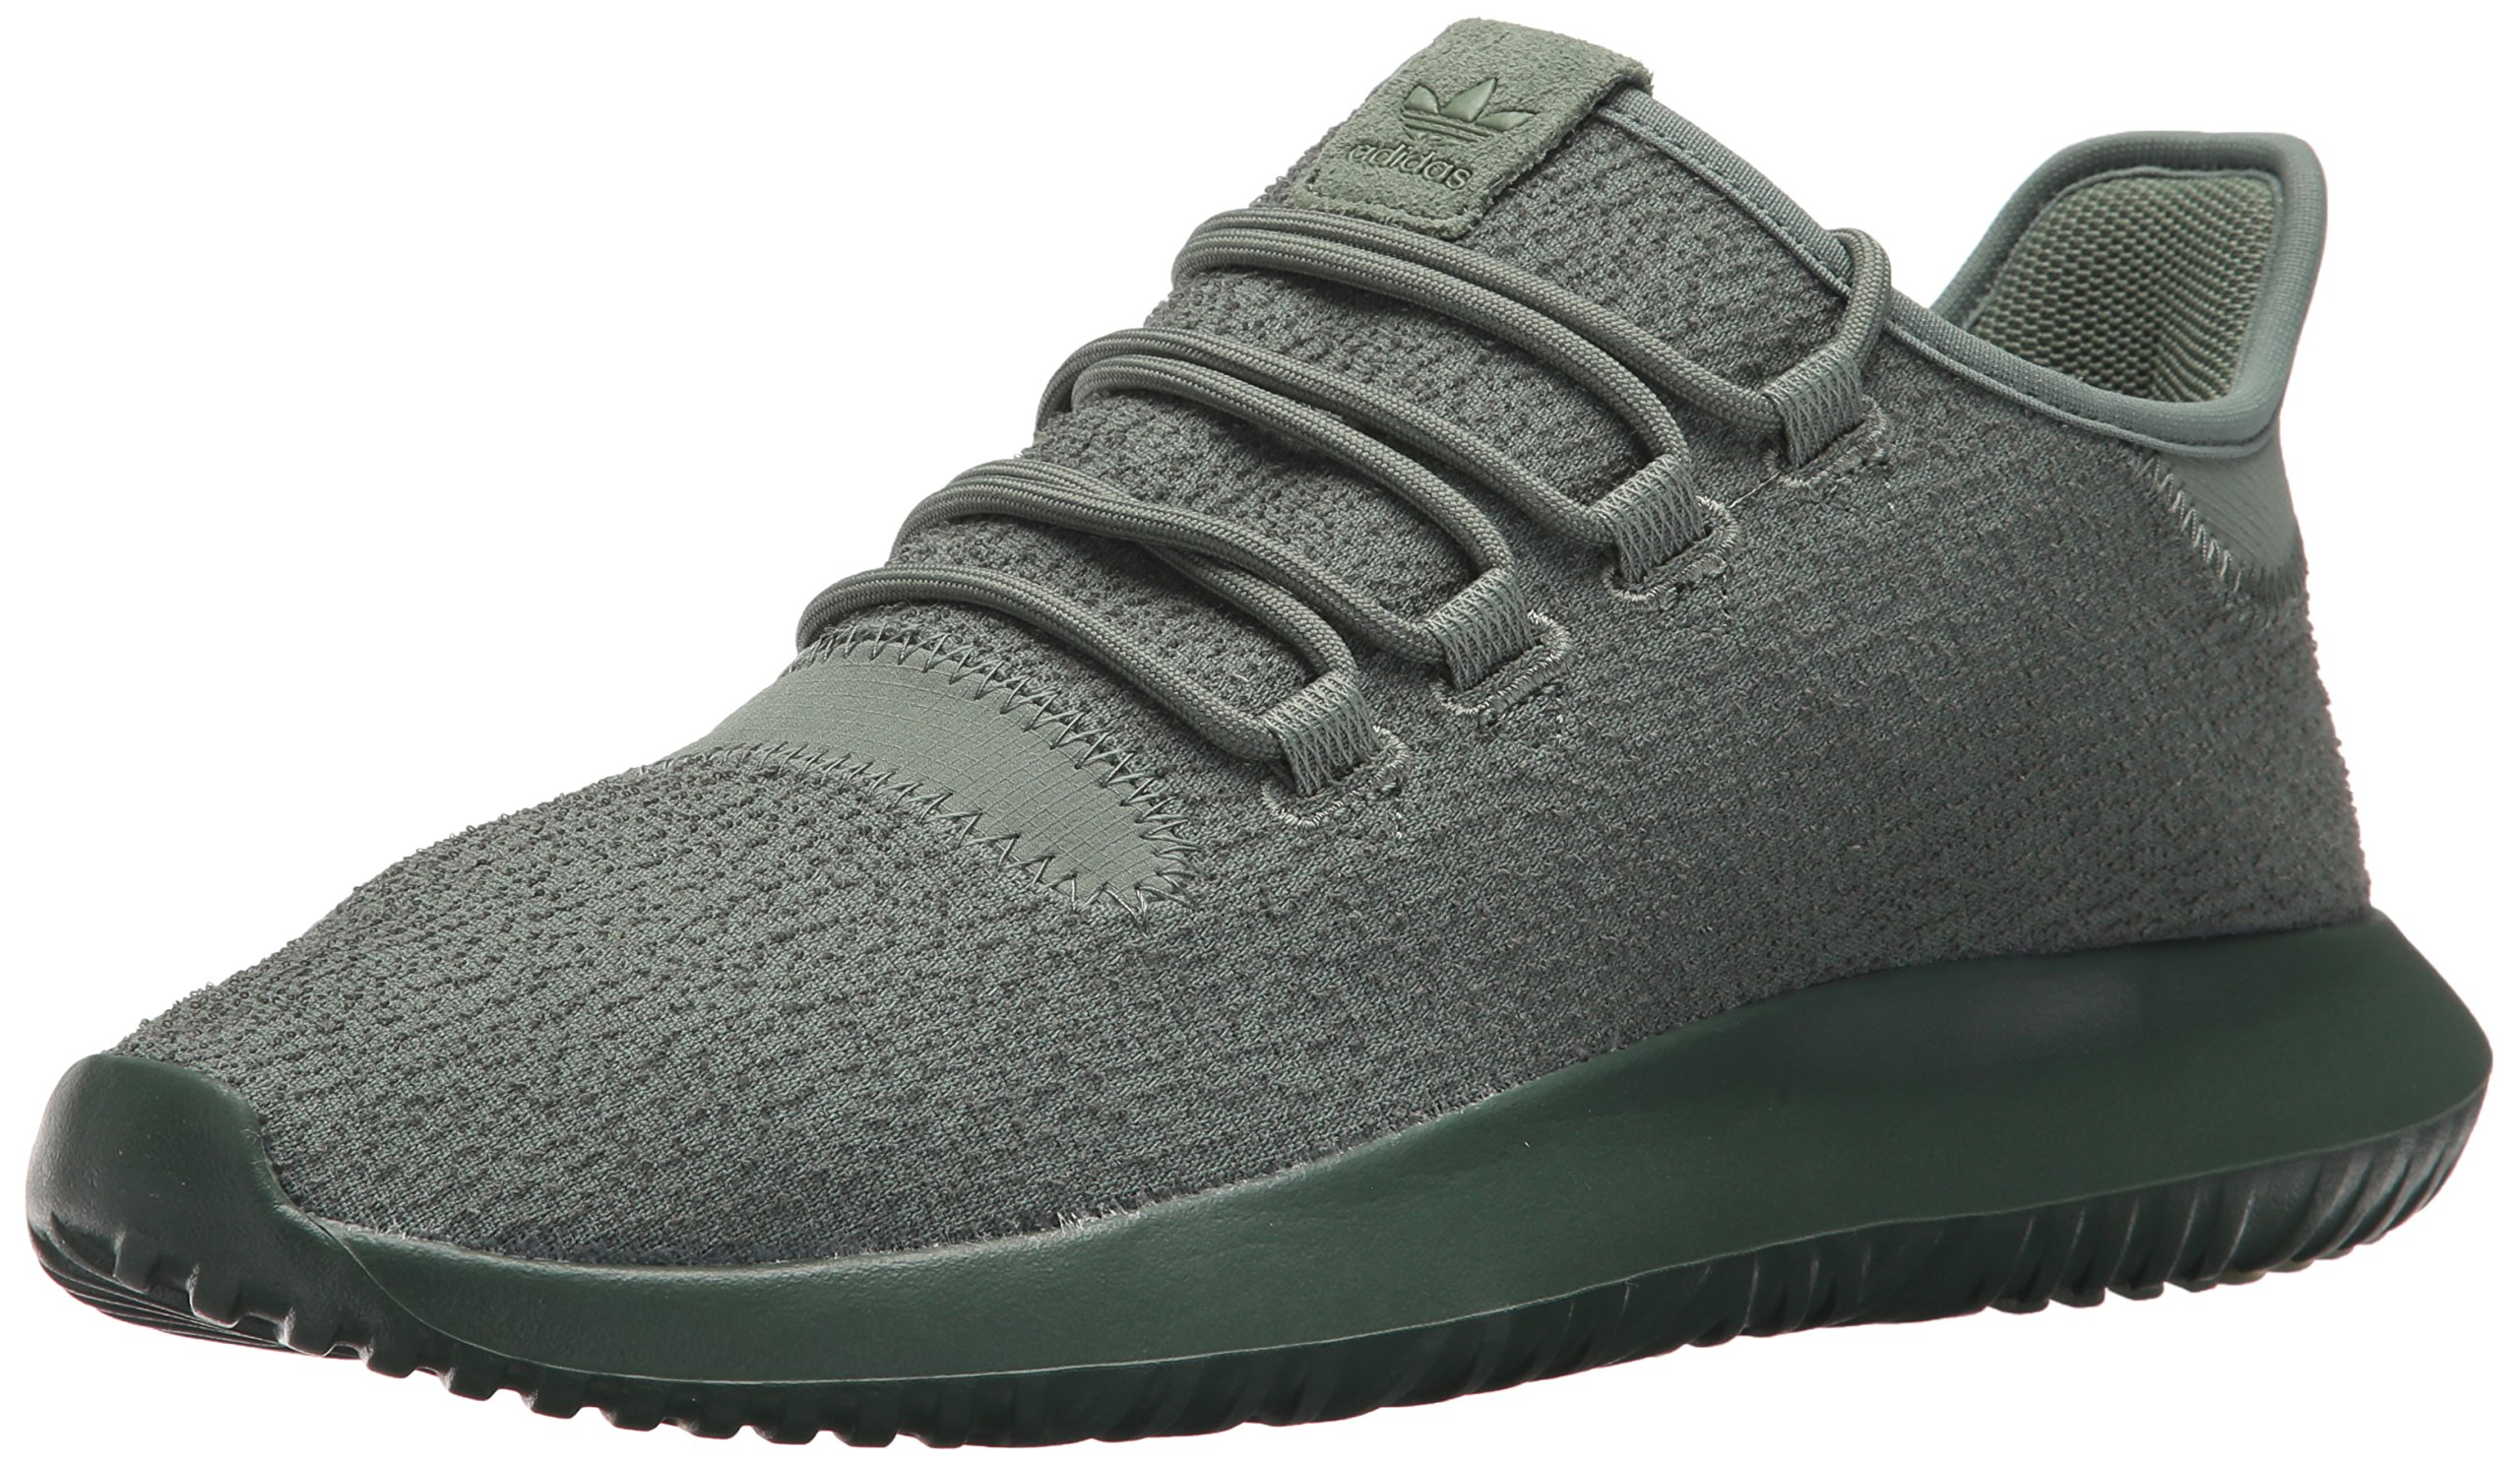 56b343060a23 Galleon - Adidas Originals Men s Tubular Shadow Sneaker Running Shoe ...